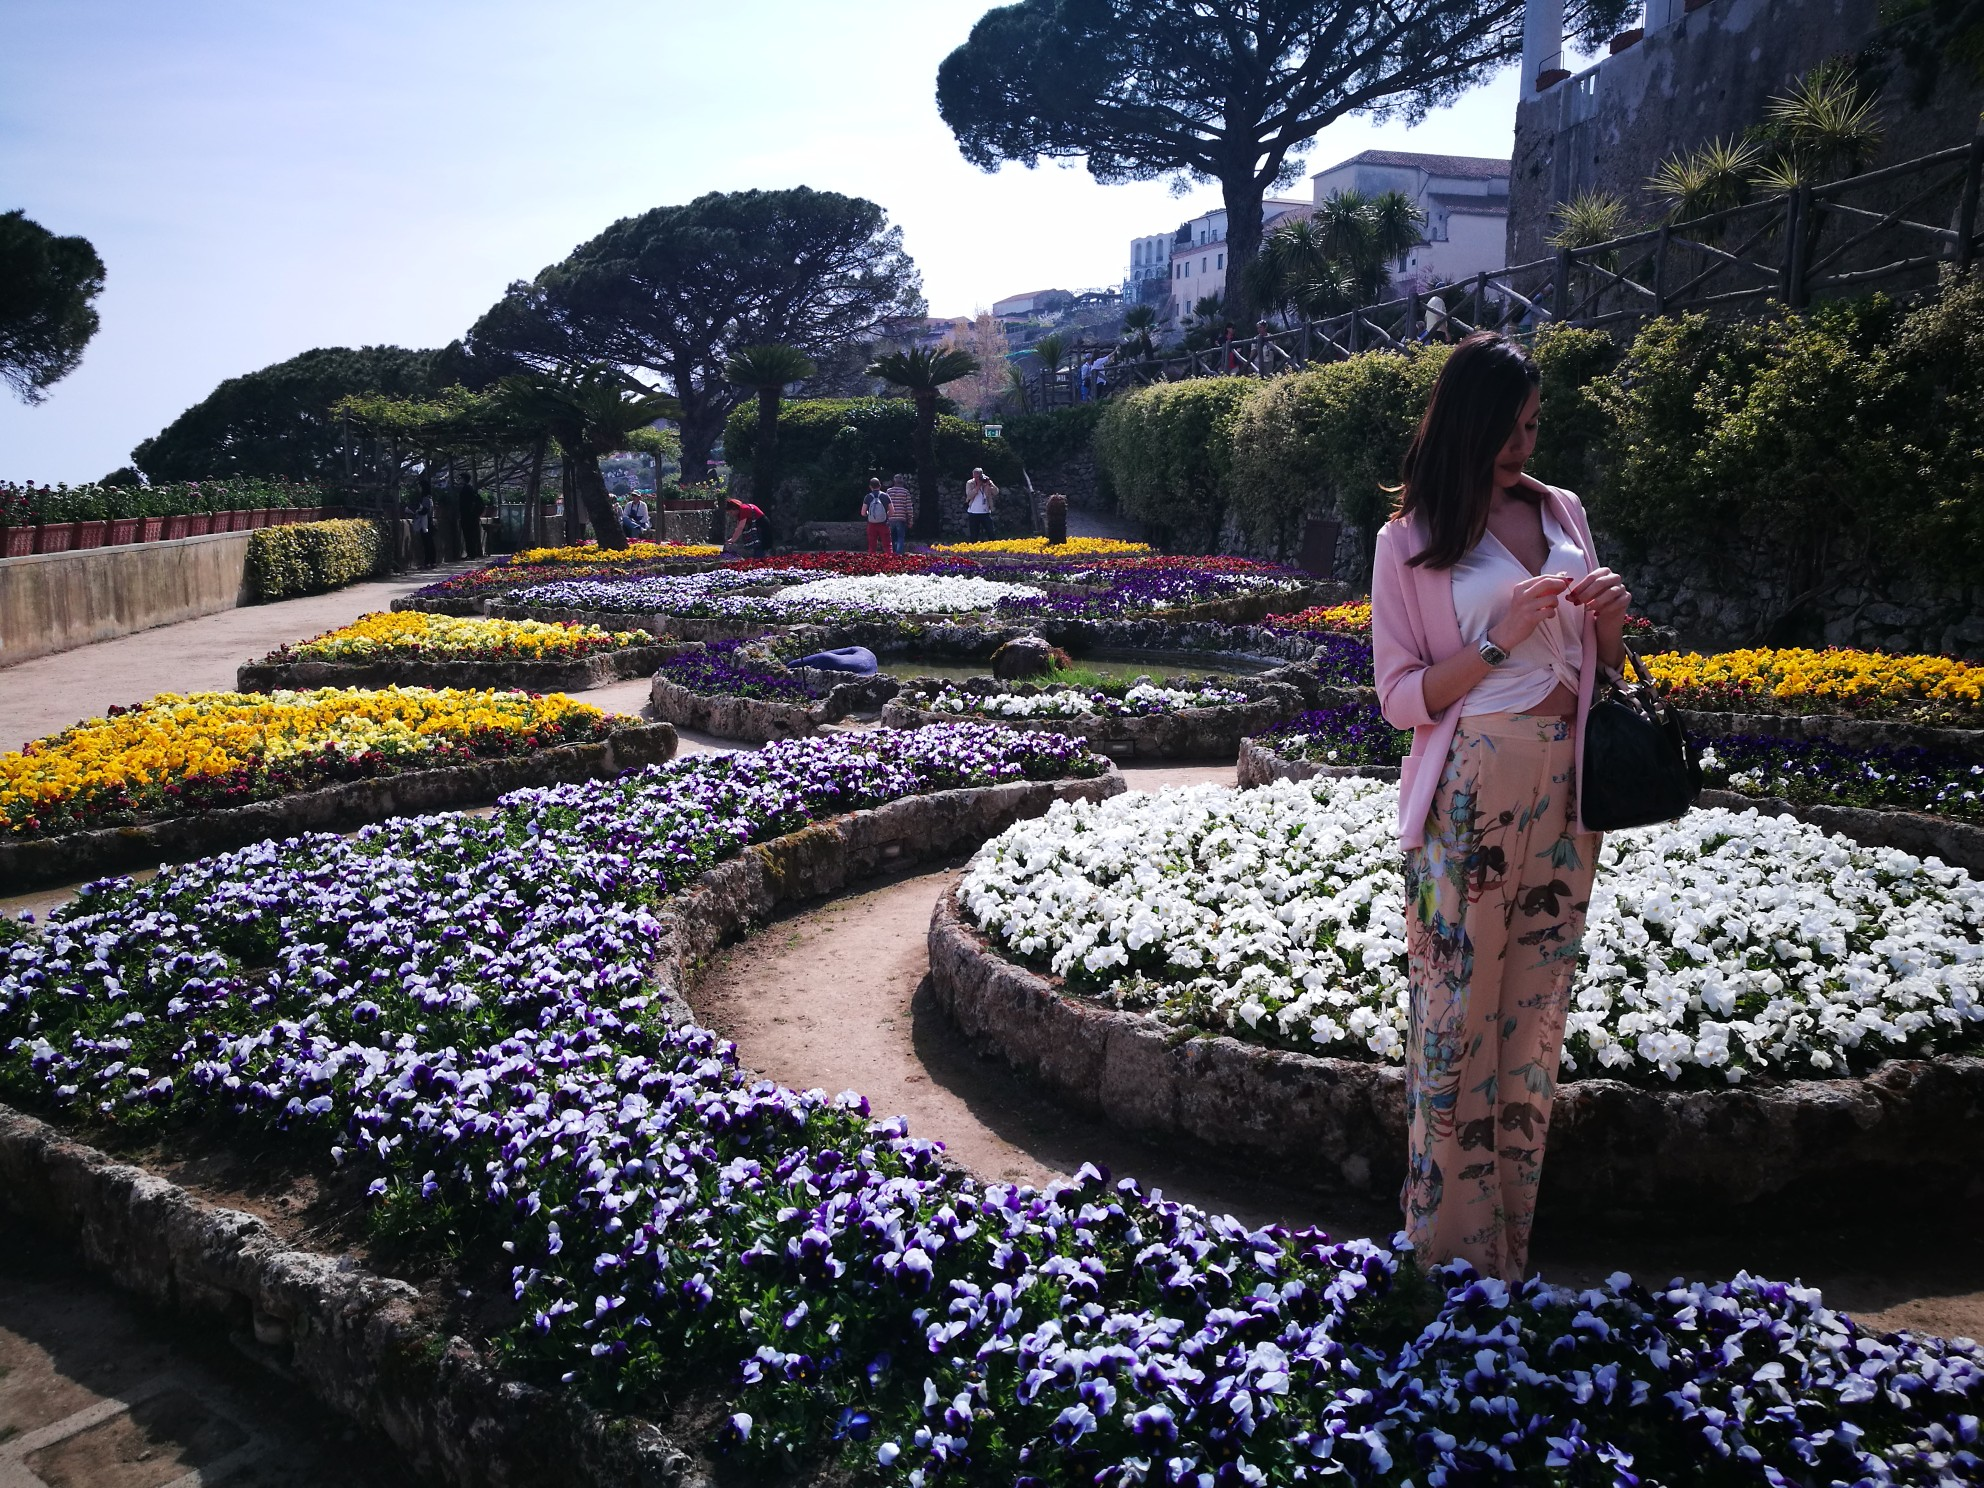 In the gardens of Villa Rufolo...